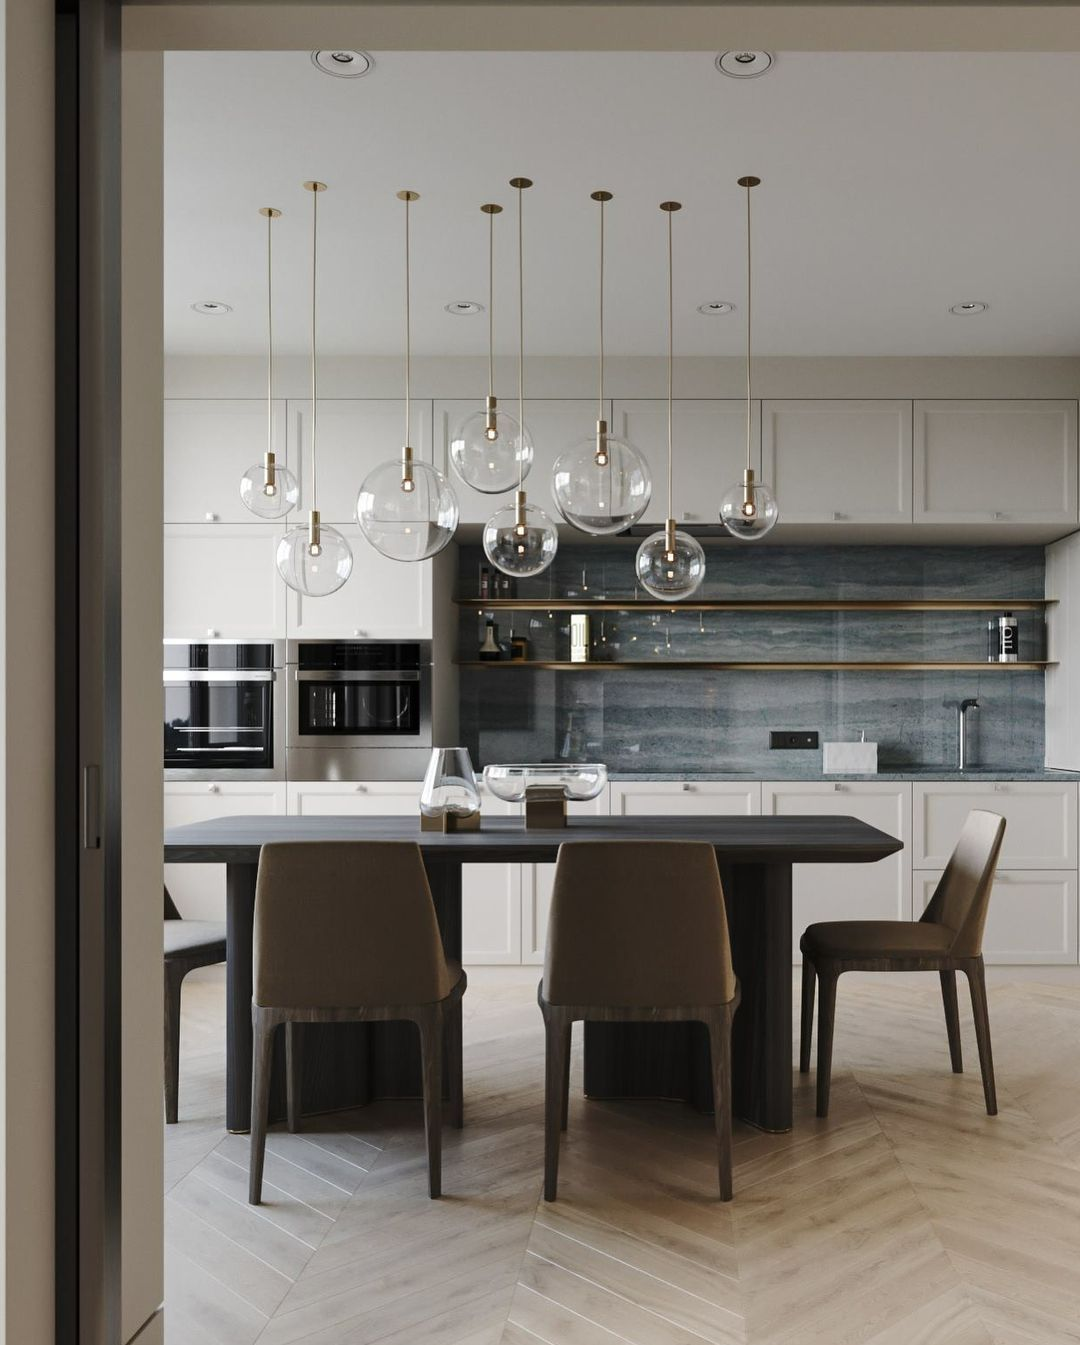 11 Tuscan Transitional Living Room Ideasinterior Design: 35 Most Popular Transitional Living Rooms Design Ideas